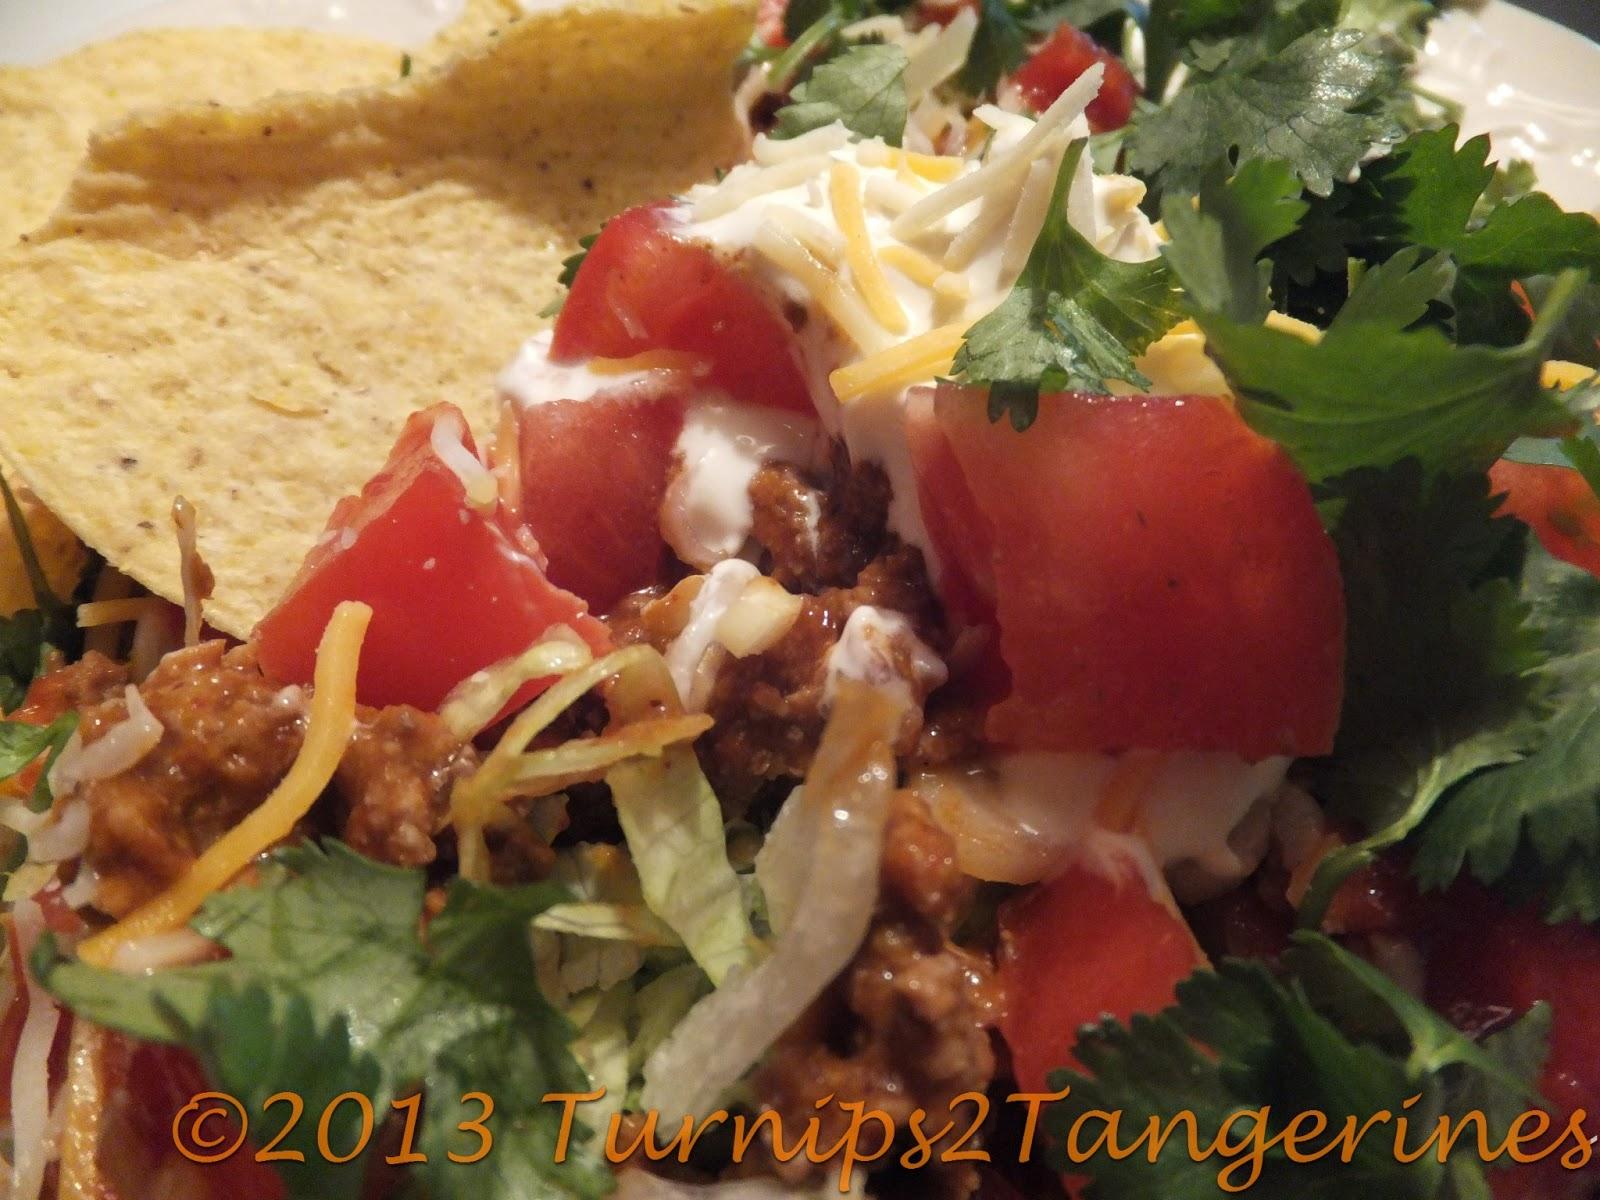 Taco Time Turnips 2 Tangerines